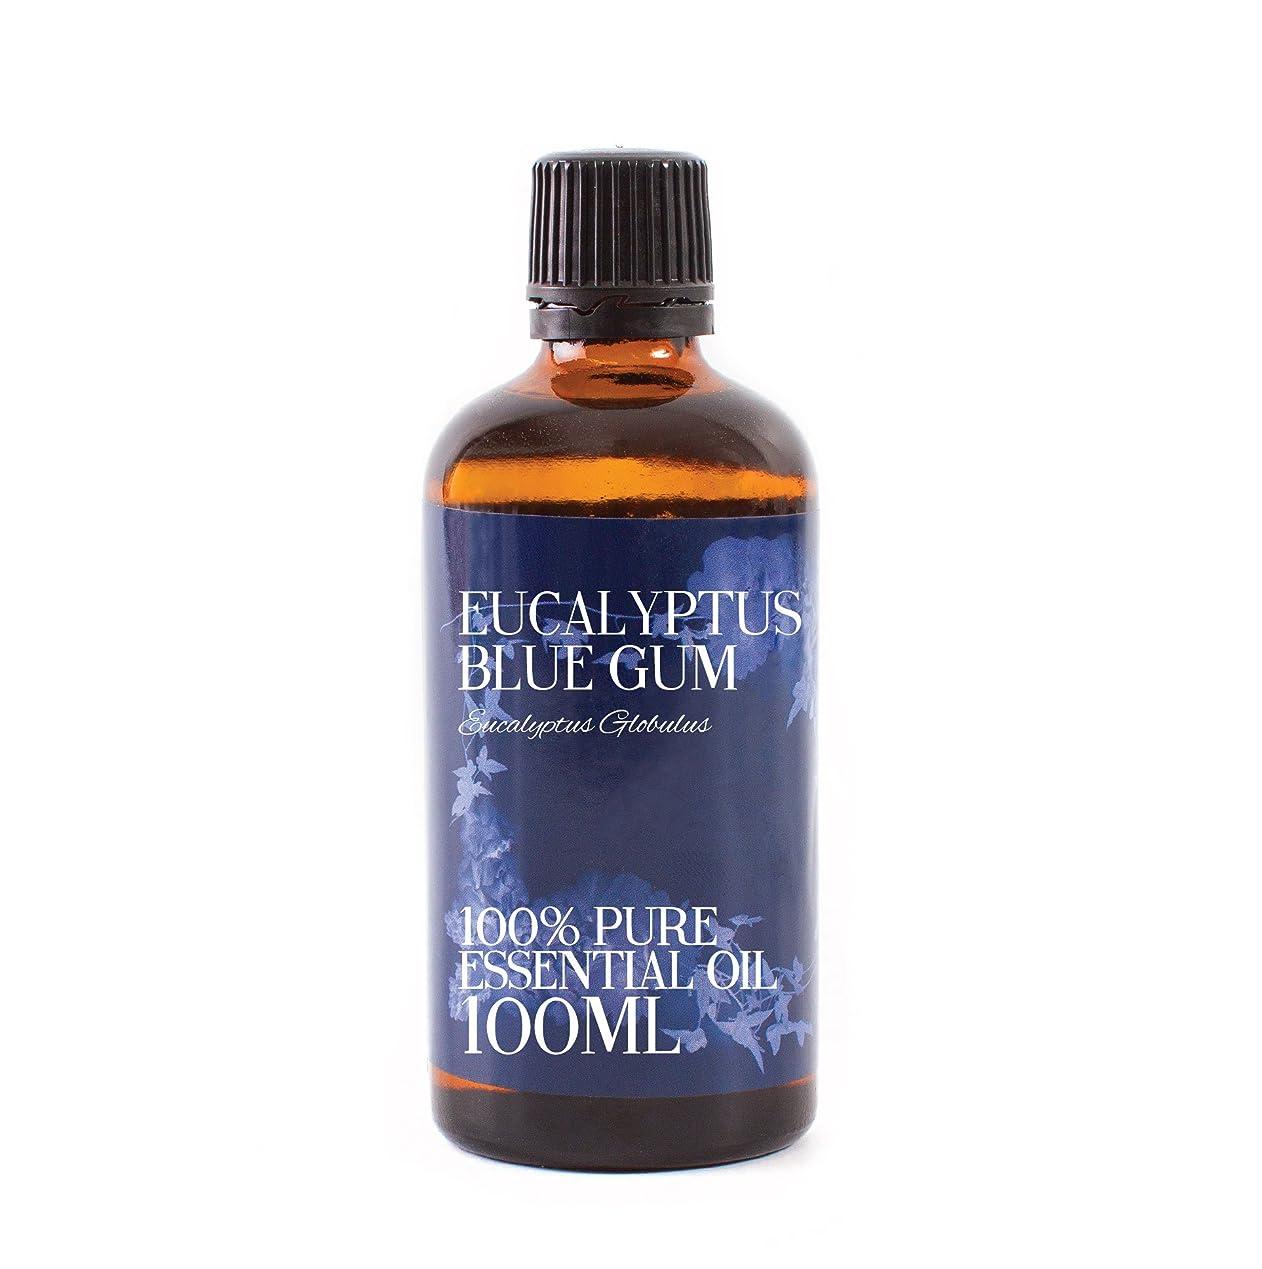 外交計算可能溶岩Mystic Moments | Eucalyptus Blue Gum Essential Oil - 100ml - 100% Pure